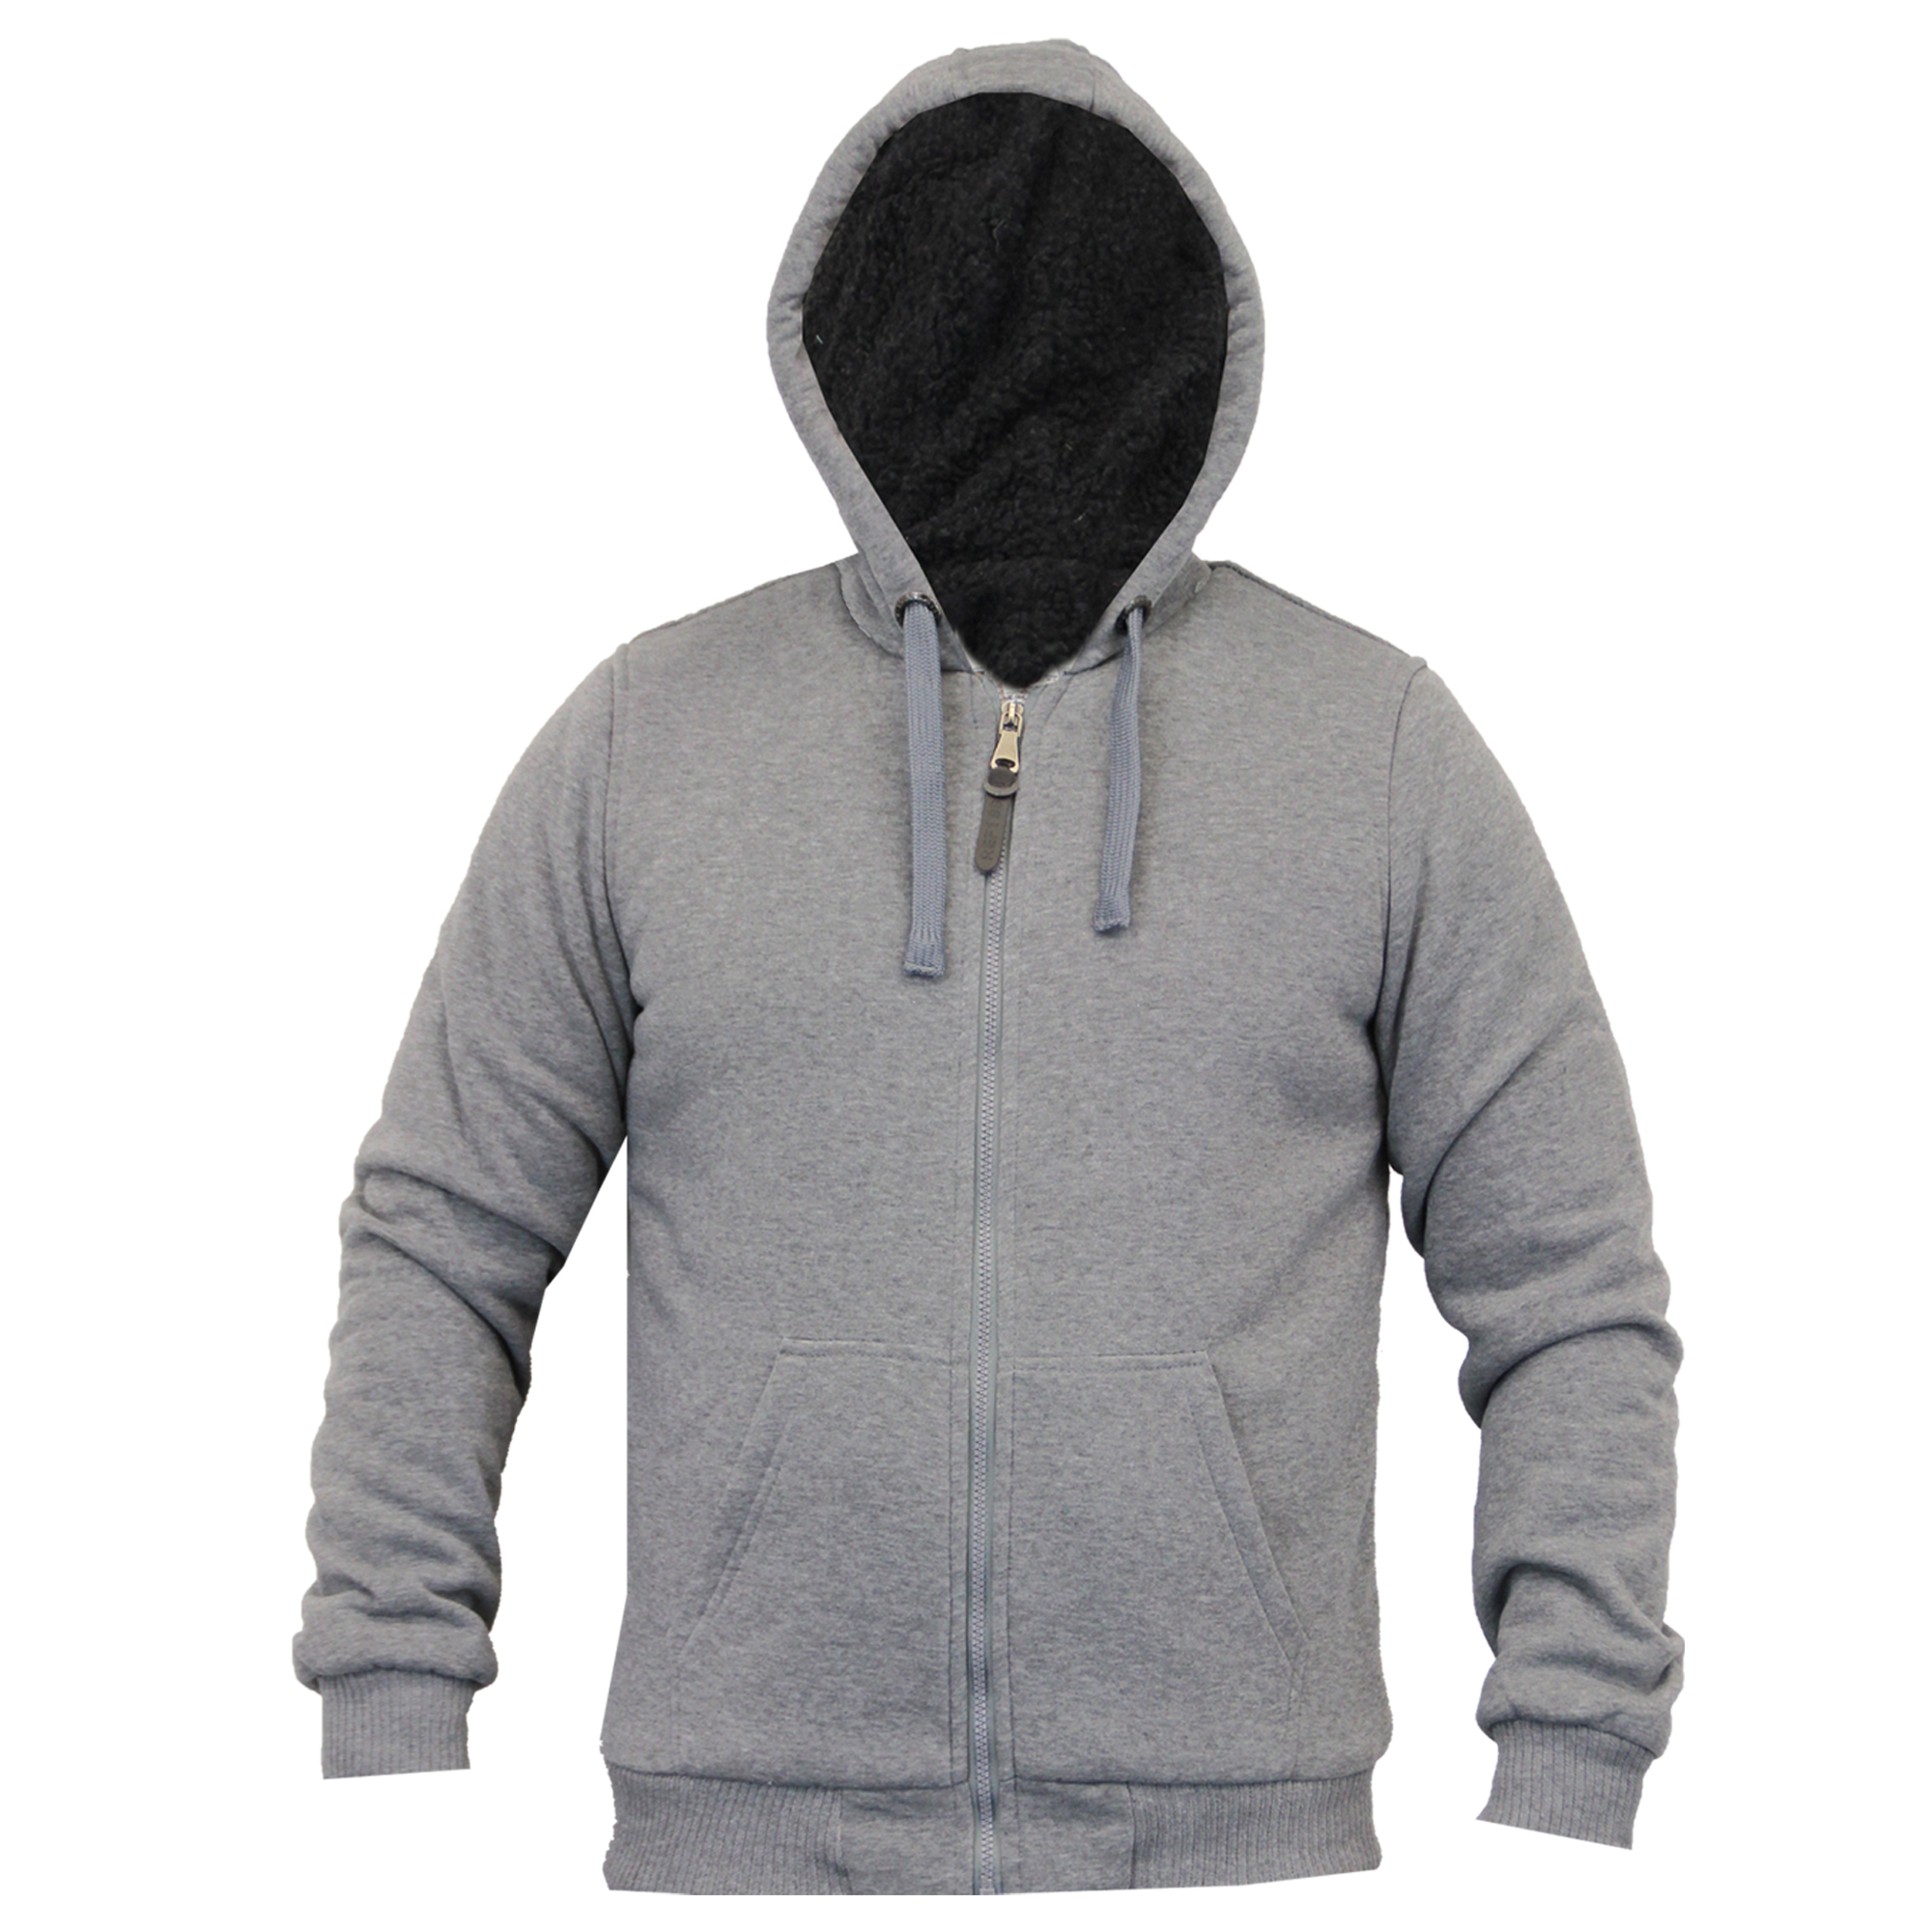 Mens Jacket Brave Soul Sweat Coat Hoodie Top Sherpa Fleece Zip Casual Winter New Ebay